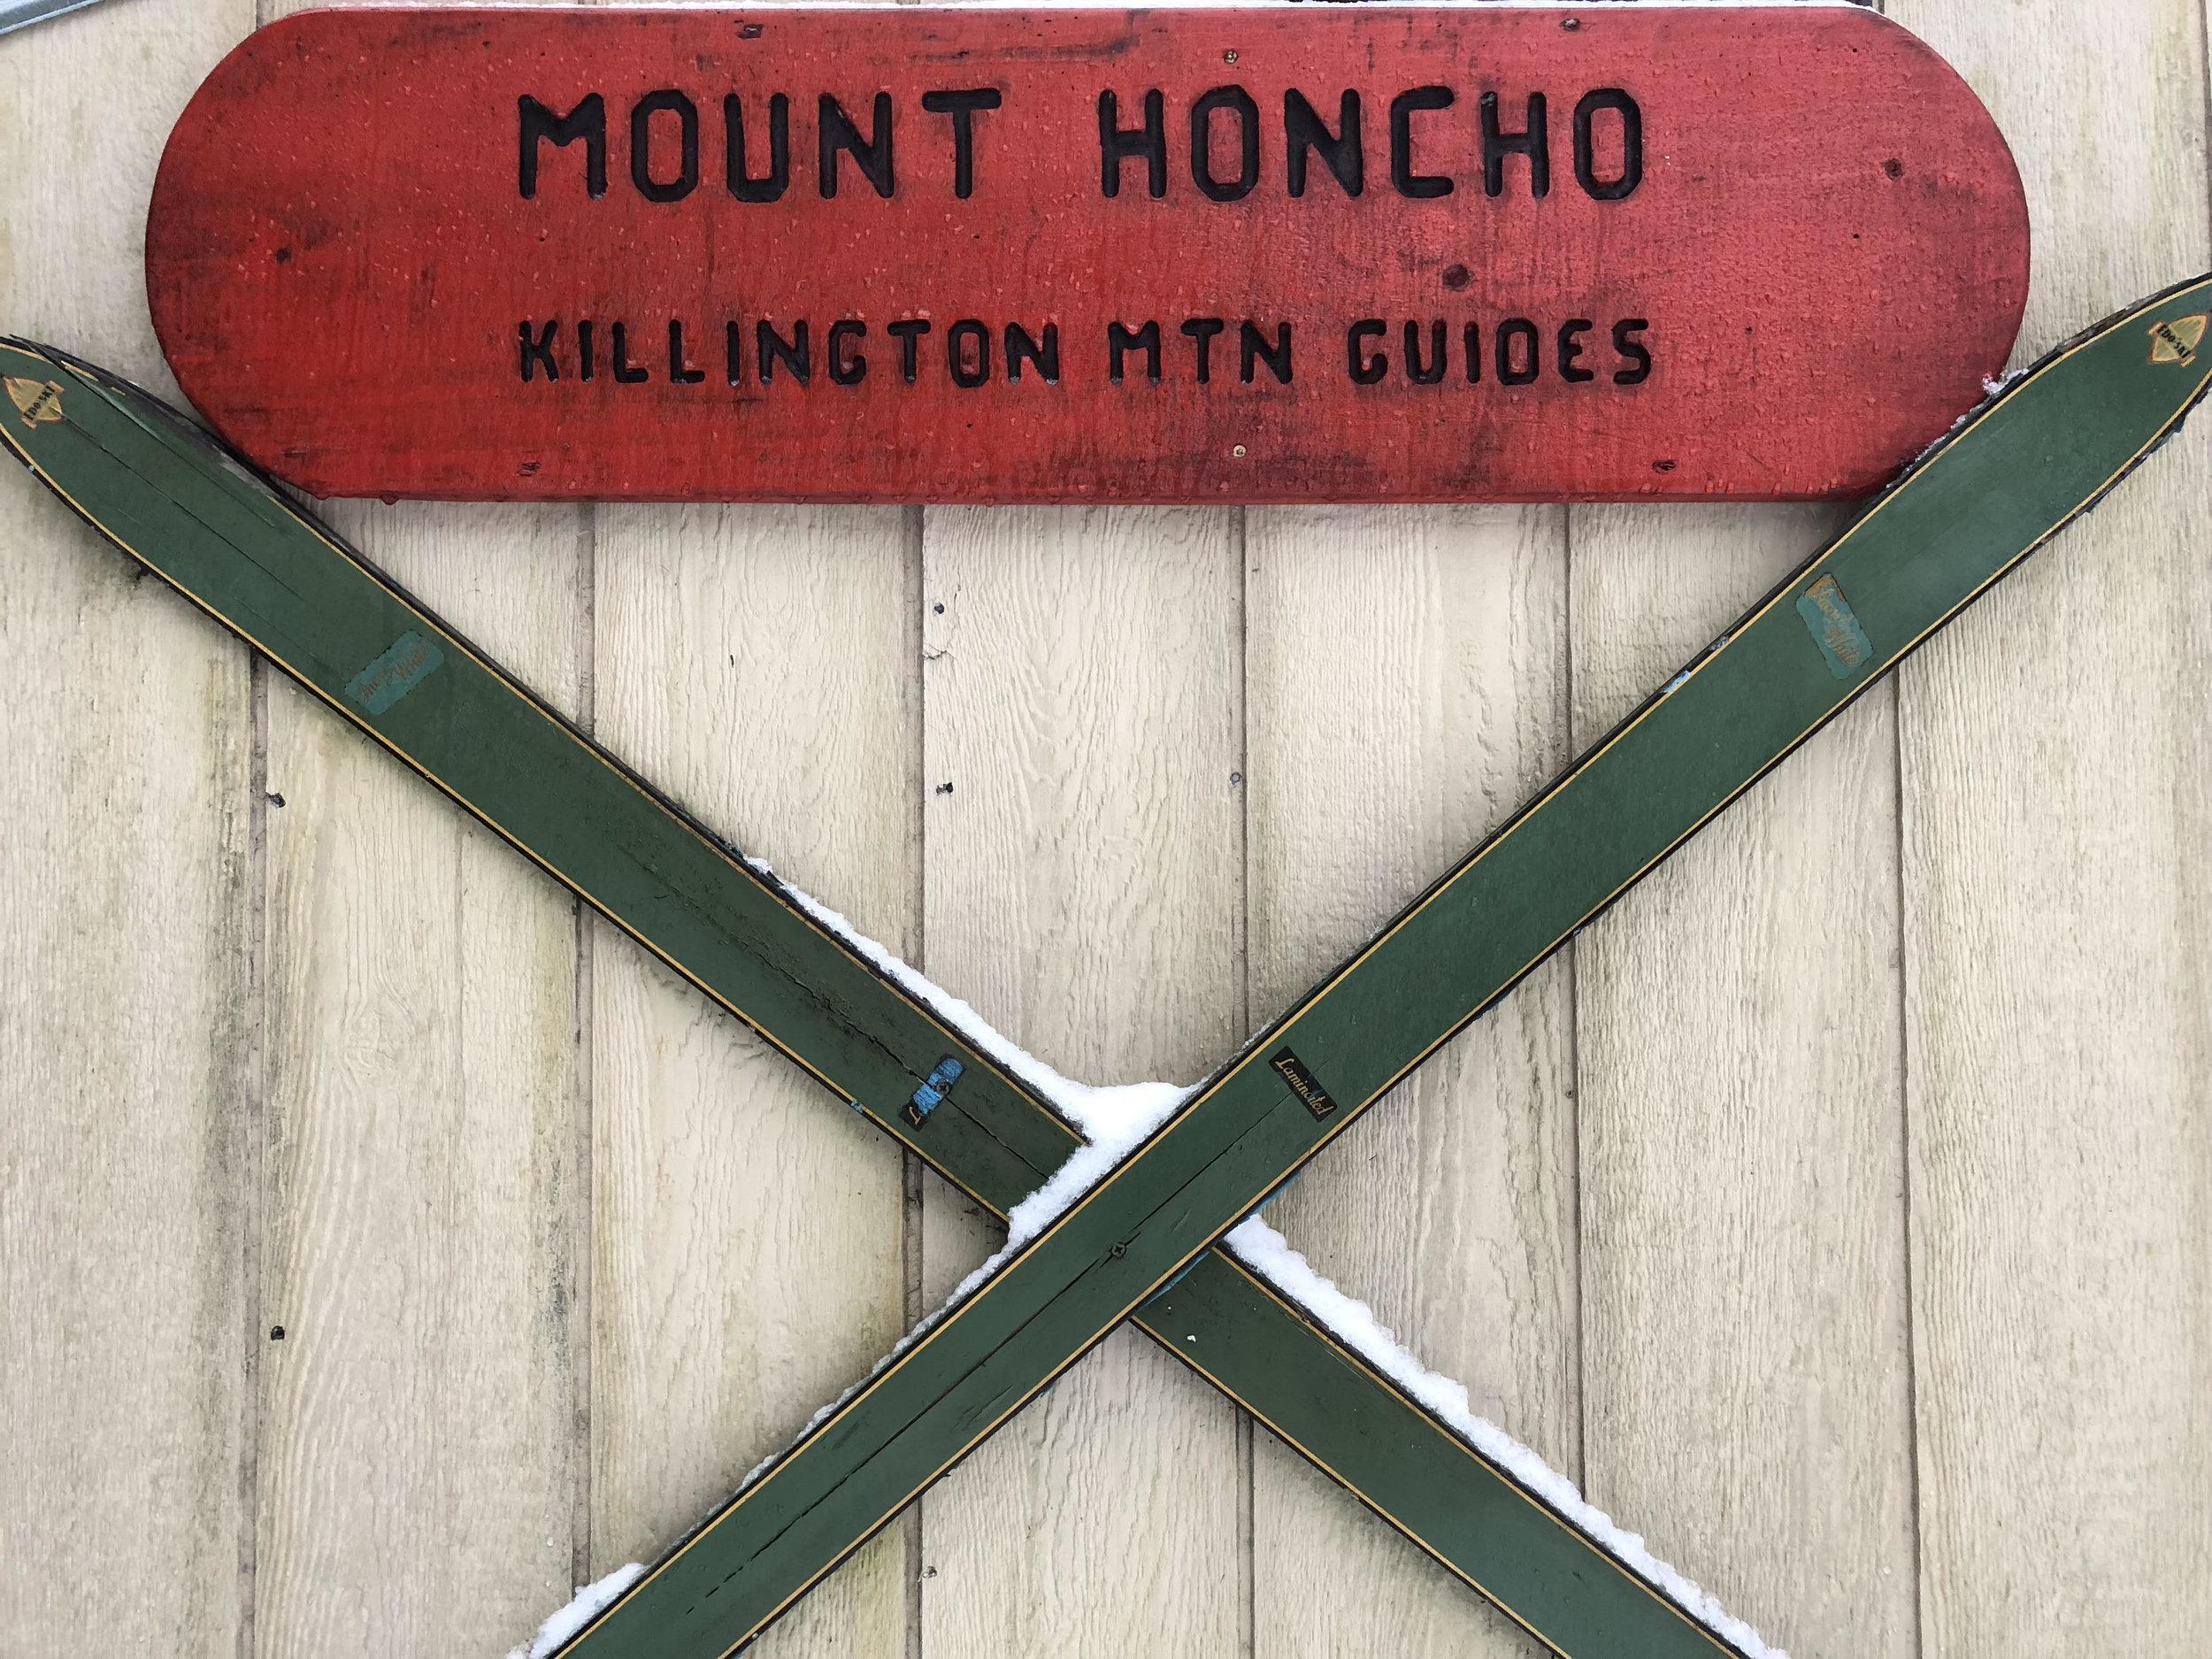 skis honcho kmg sign.jpg